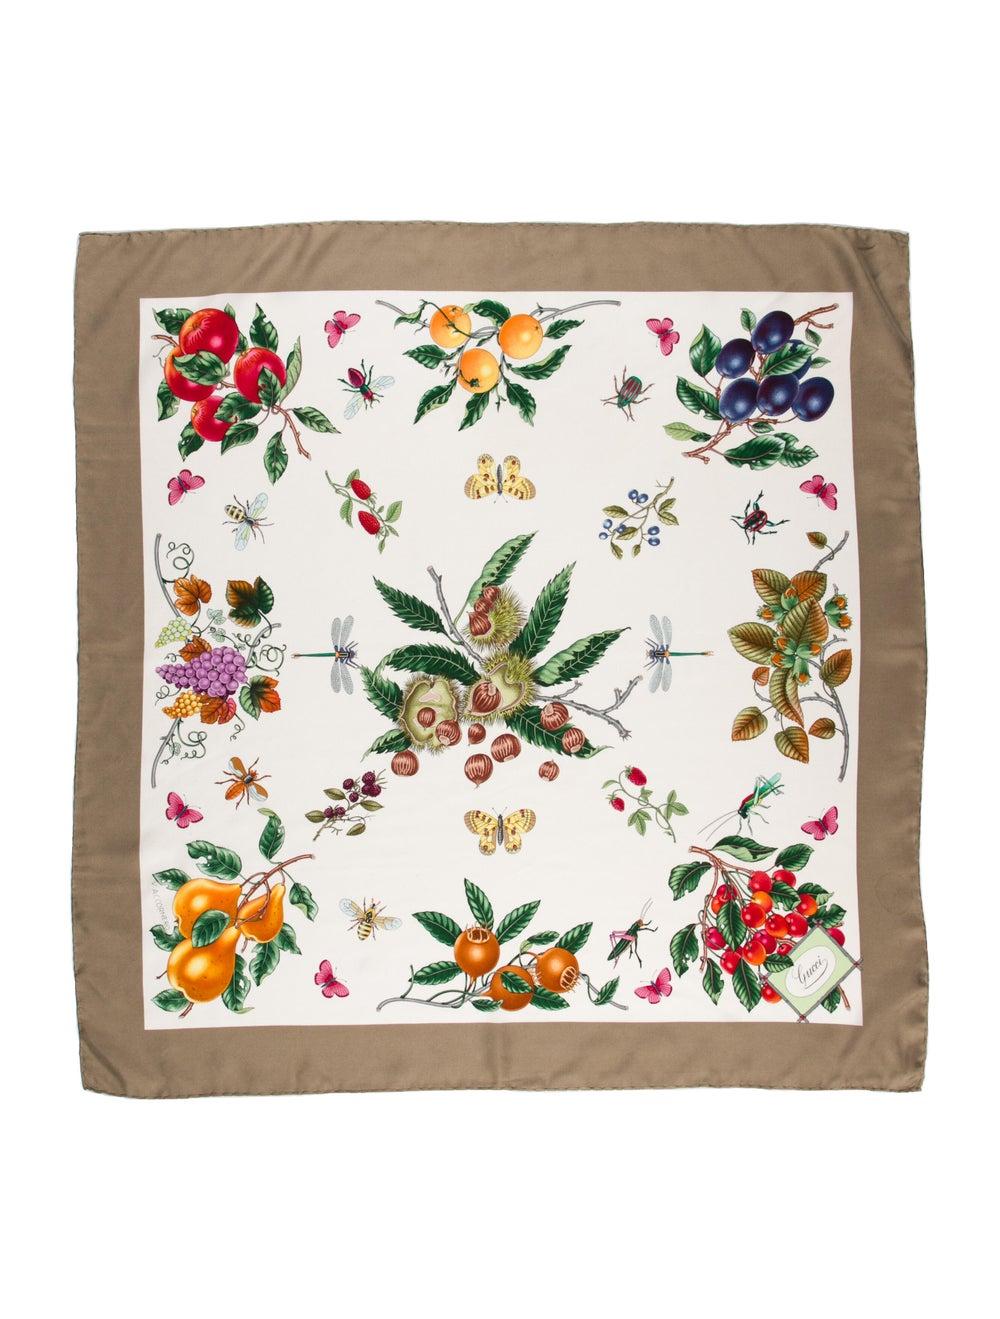 Gucci Silk Floral Print Scarf - image 1